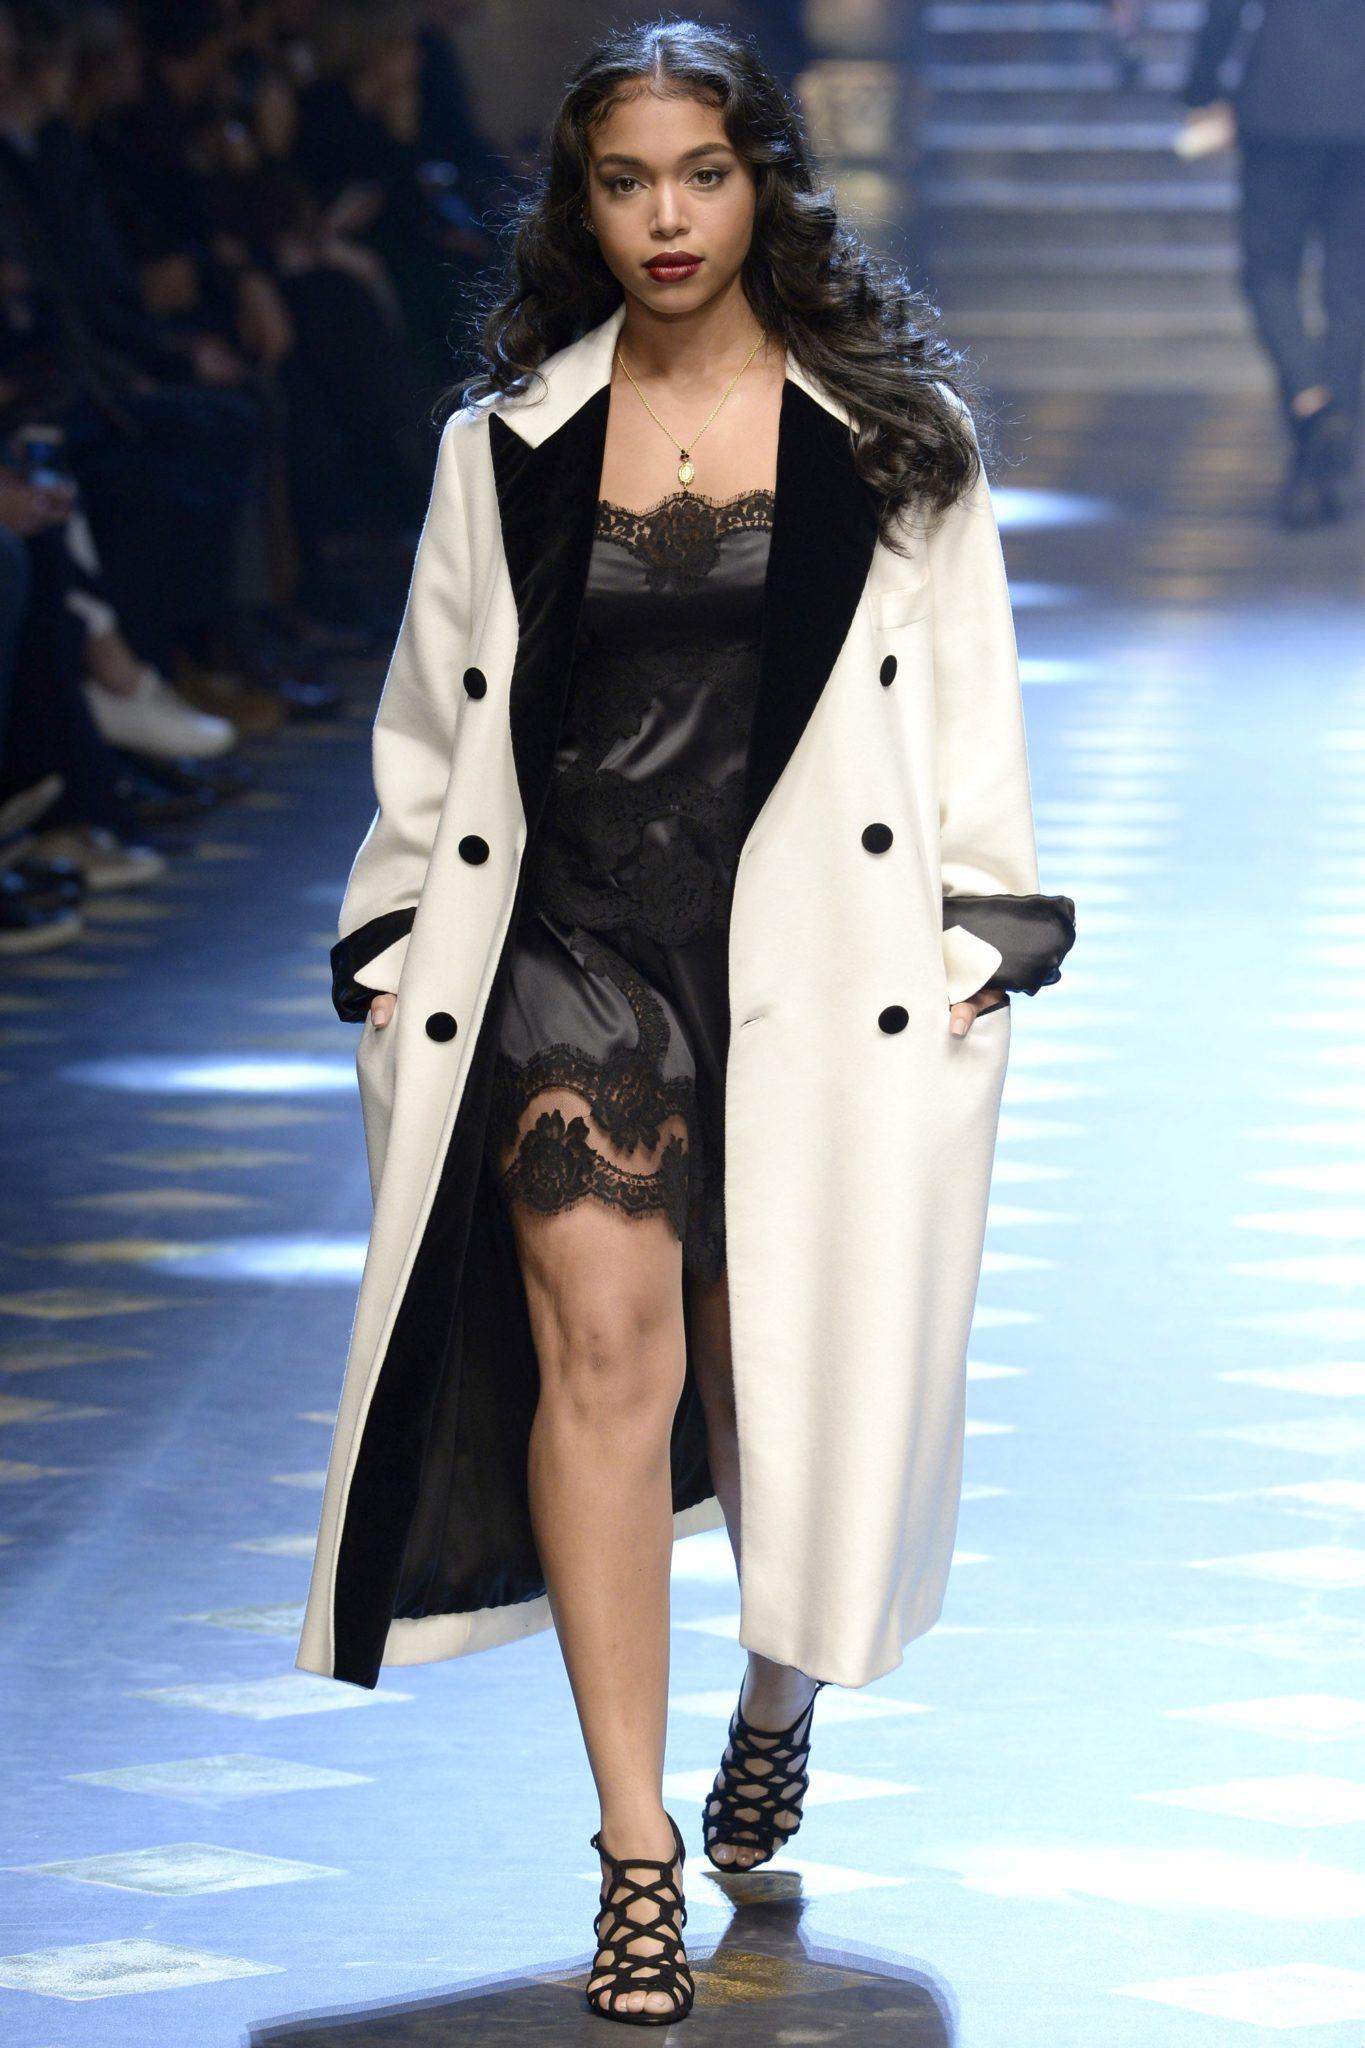 Lori Harvey, Diggy Simmons Model For Dolce & Gabbana Fall 2017 Show